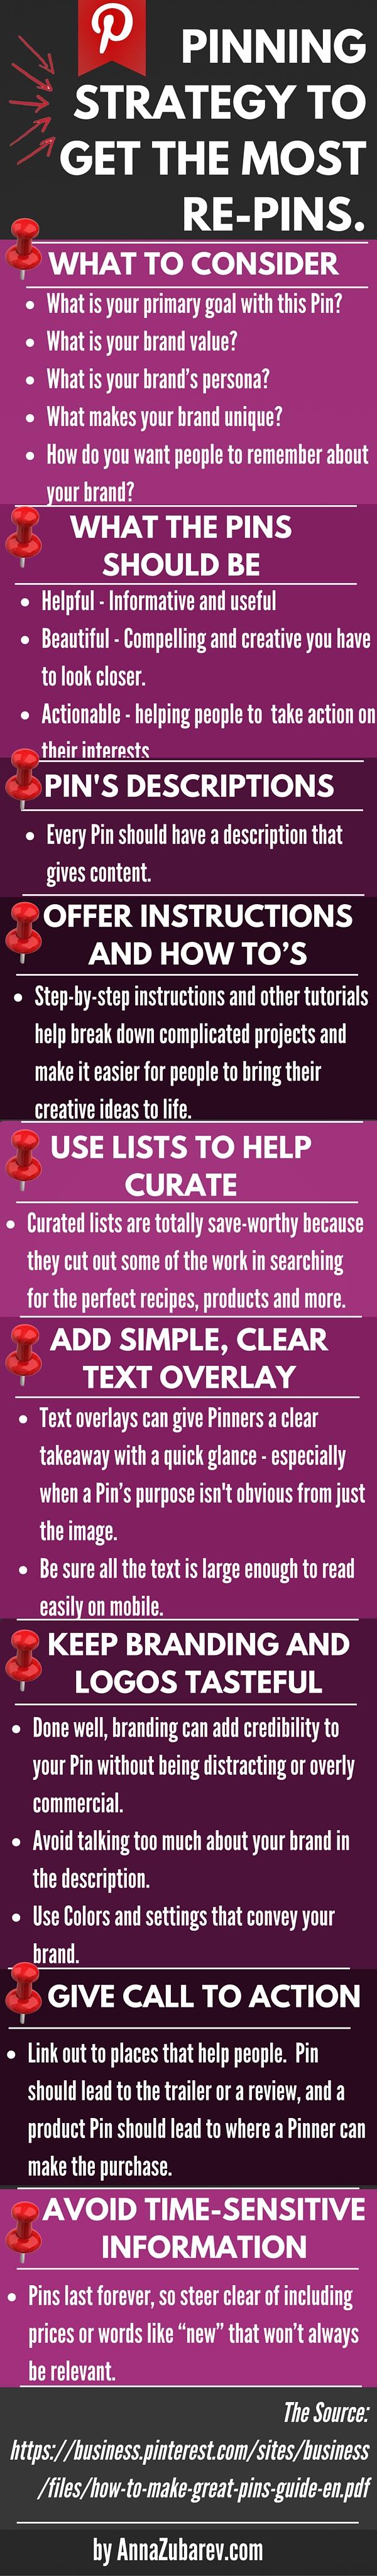 Pinning Strategies Checklist To Get The Most RePins. via @annazubarev